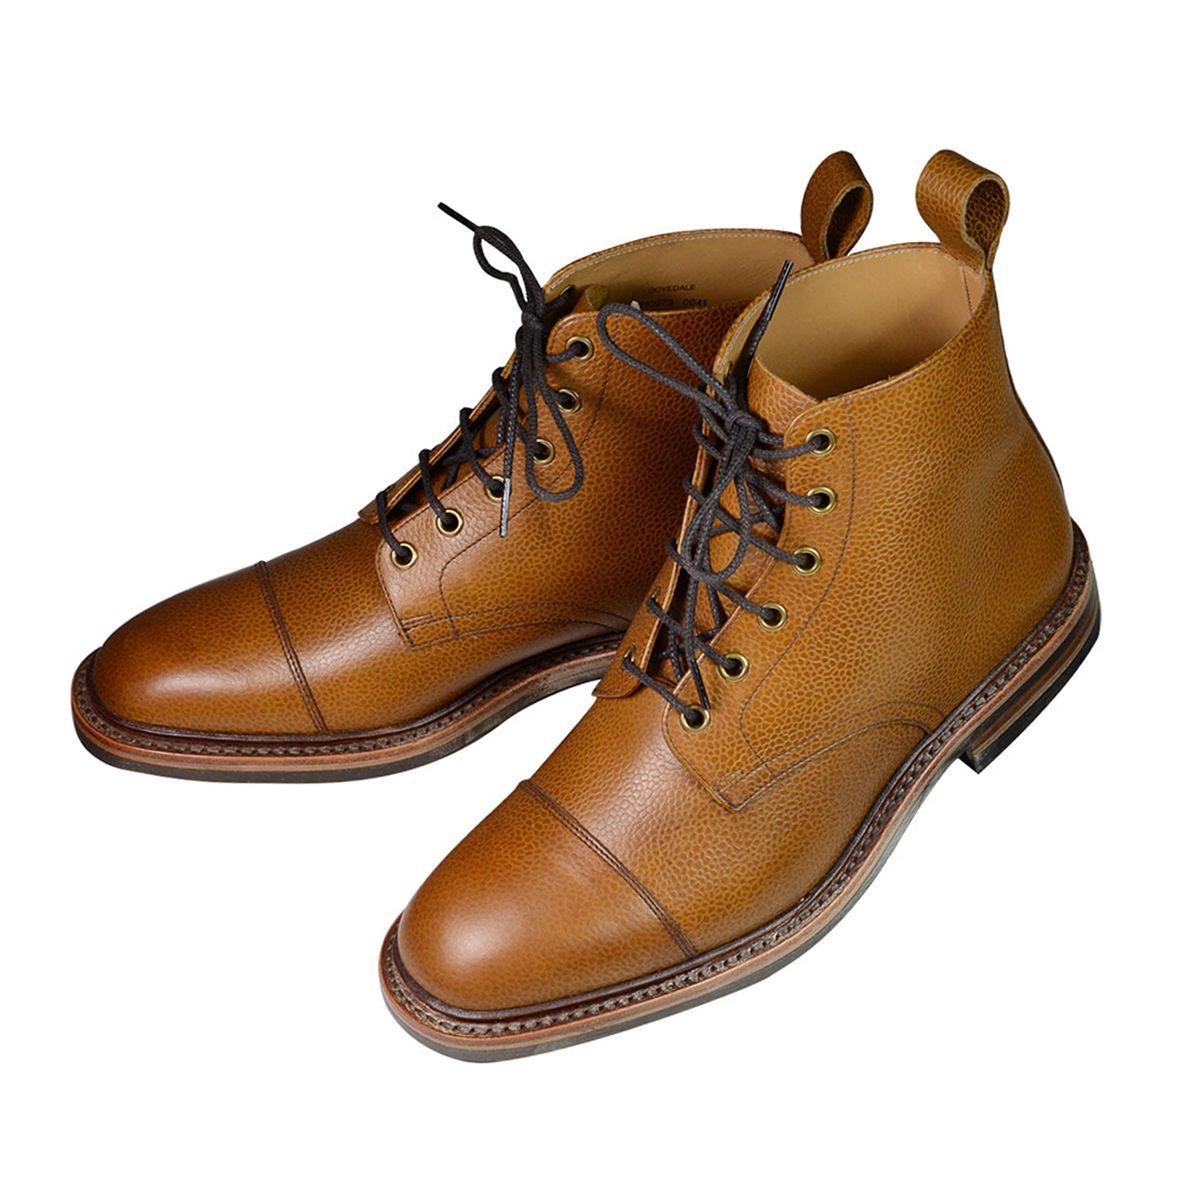 Loake Dovedale Tan Grain 2 Jpg Dress Shoes Men Boots Oxford Shoes